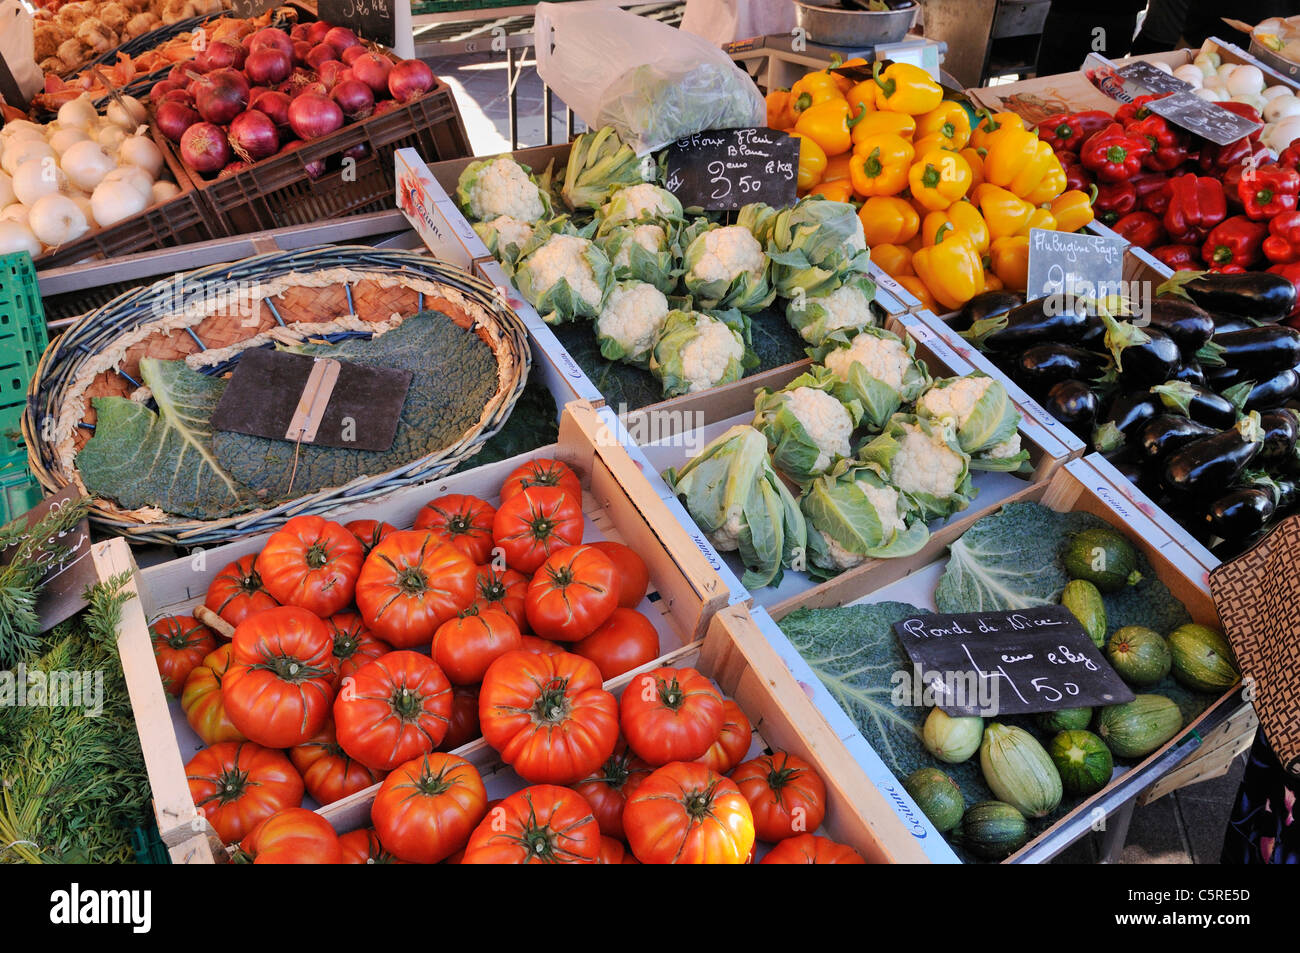 Europe, France, Provence, Alpes Maritimes, Cote d'Azur, Nice, Various fresh vegetables on market stall - Stock Image